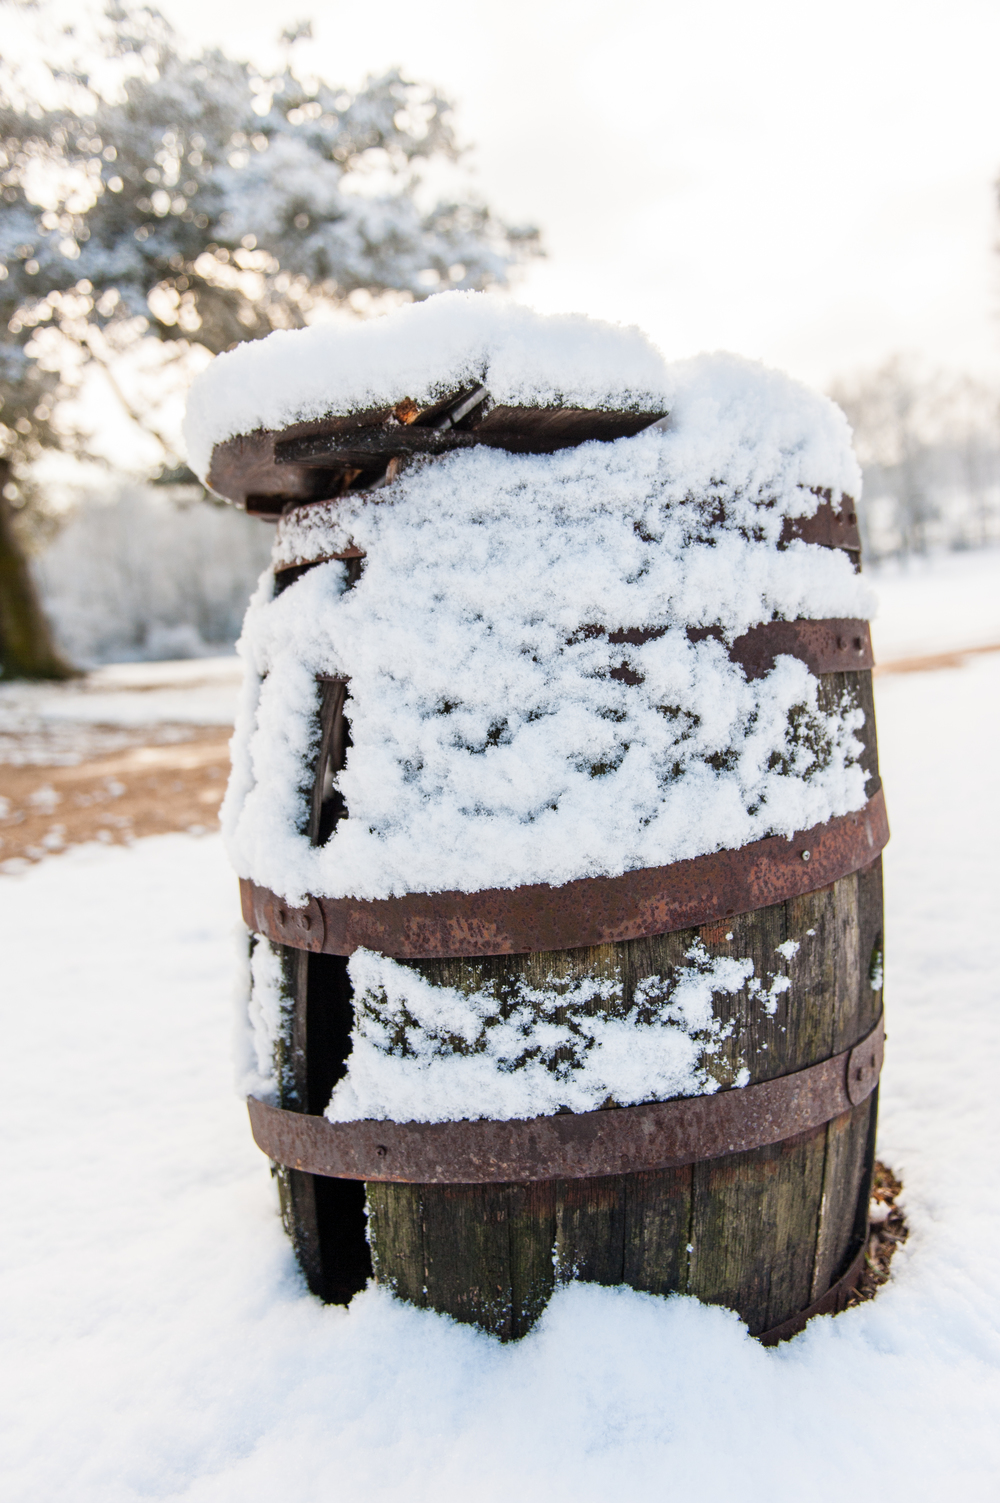 Winter_006.jpg